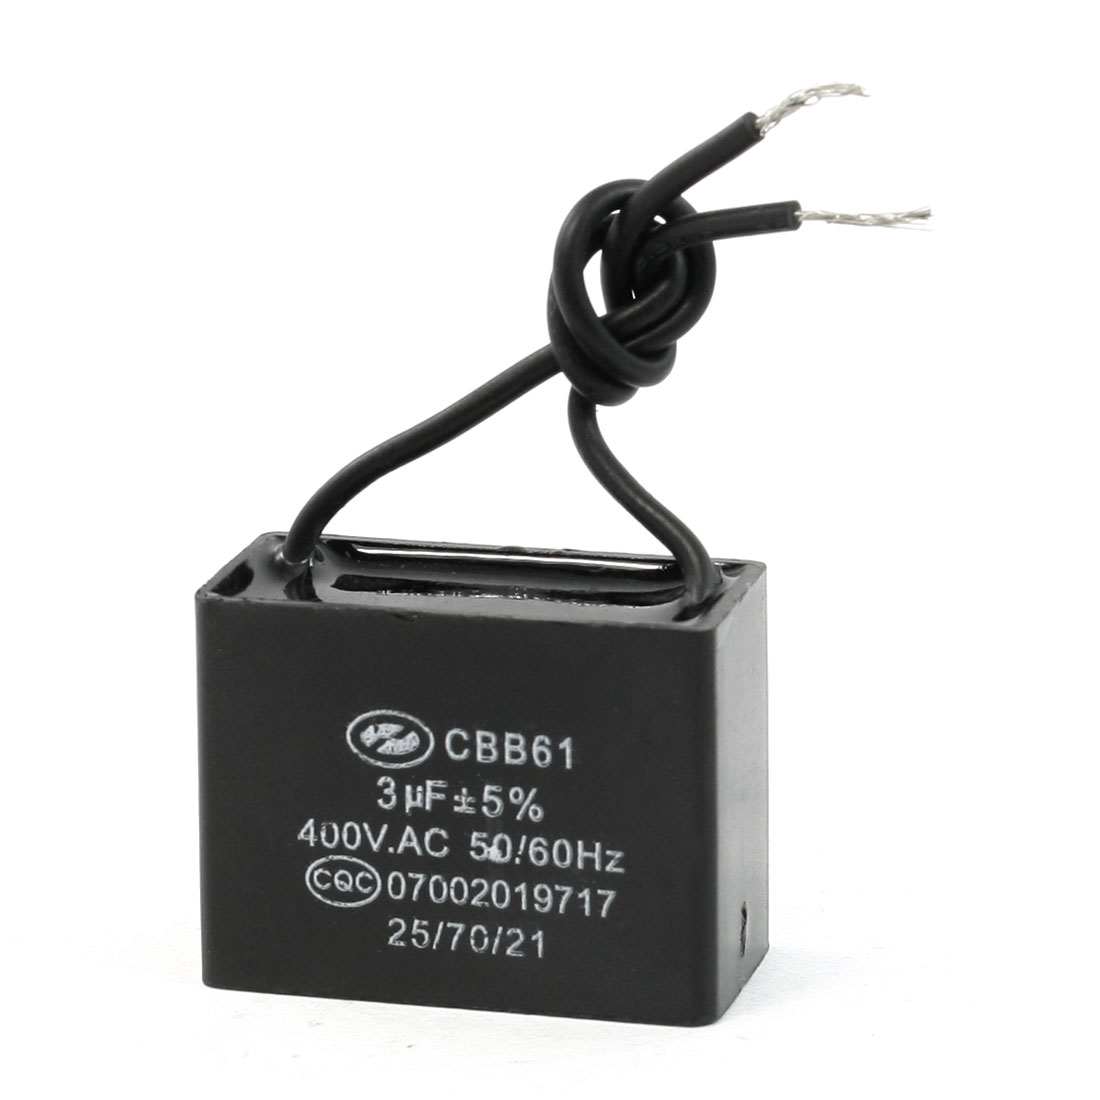 Non Polar Wired 50/60Hz CBB61 Type Motor Running Capacitor 3uF AC 400V